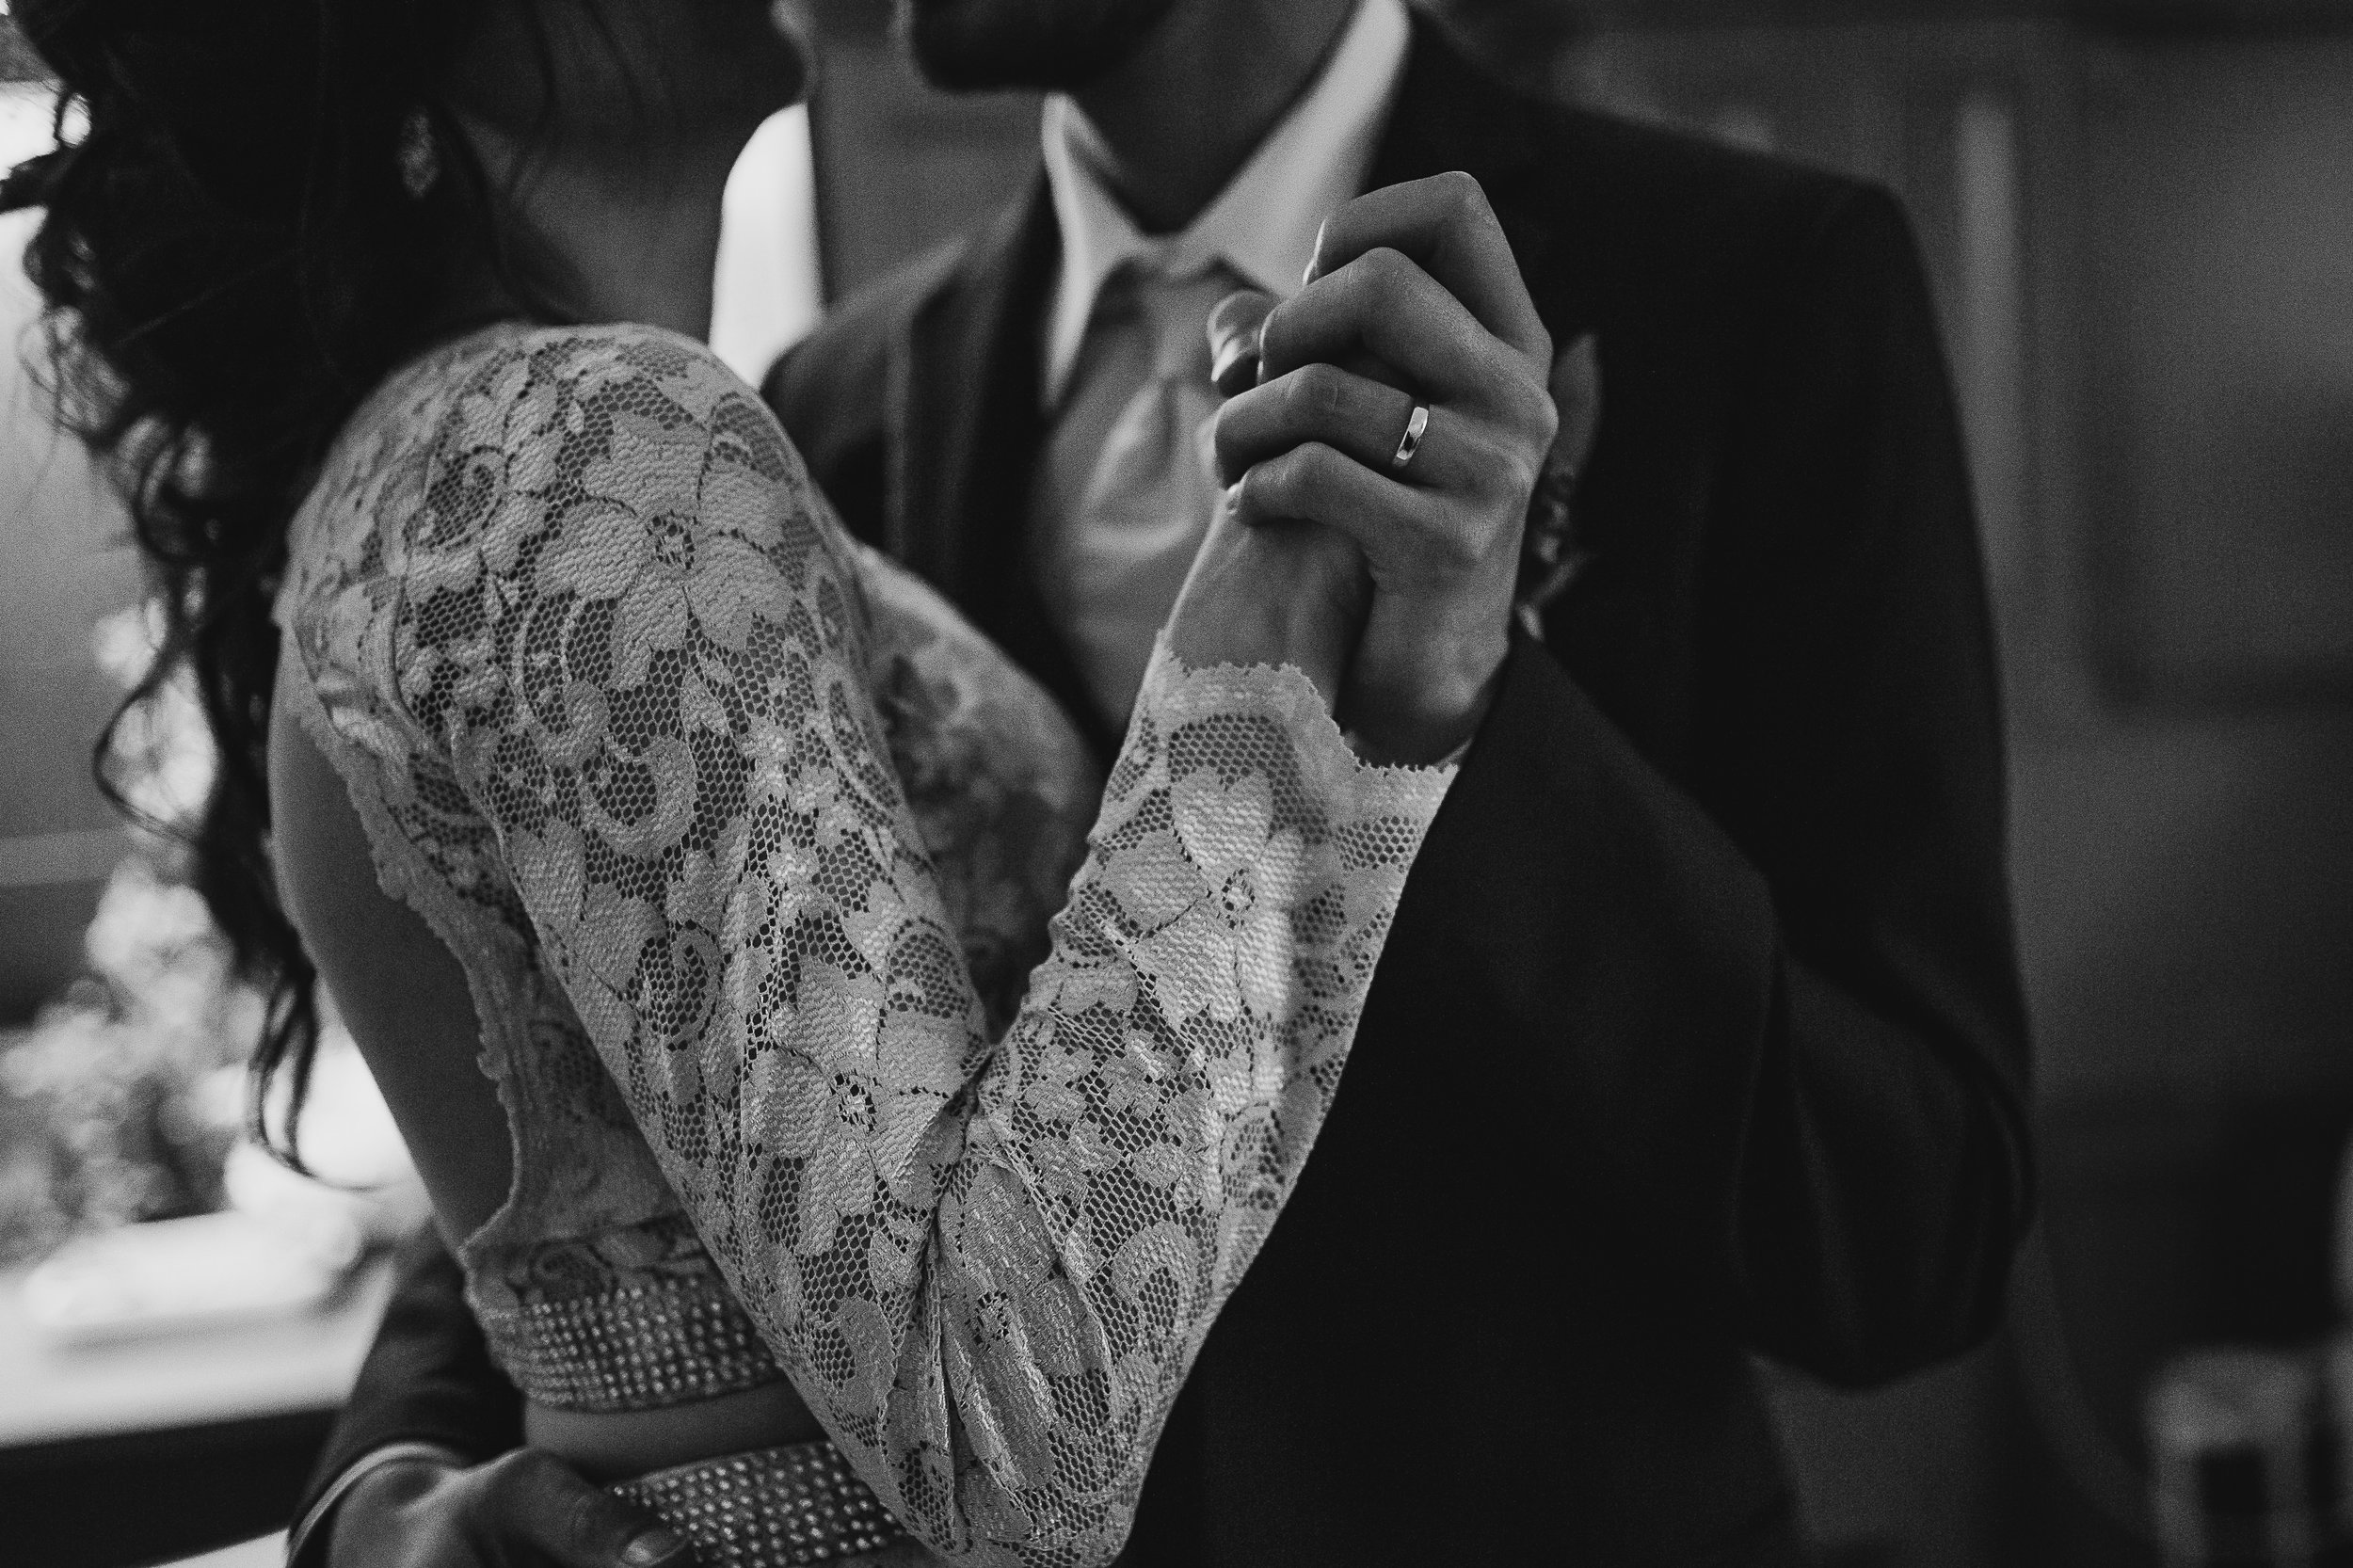 cassie-cook-photography-memphis-wedding-photographer-loya-first-dance